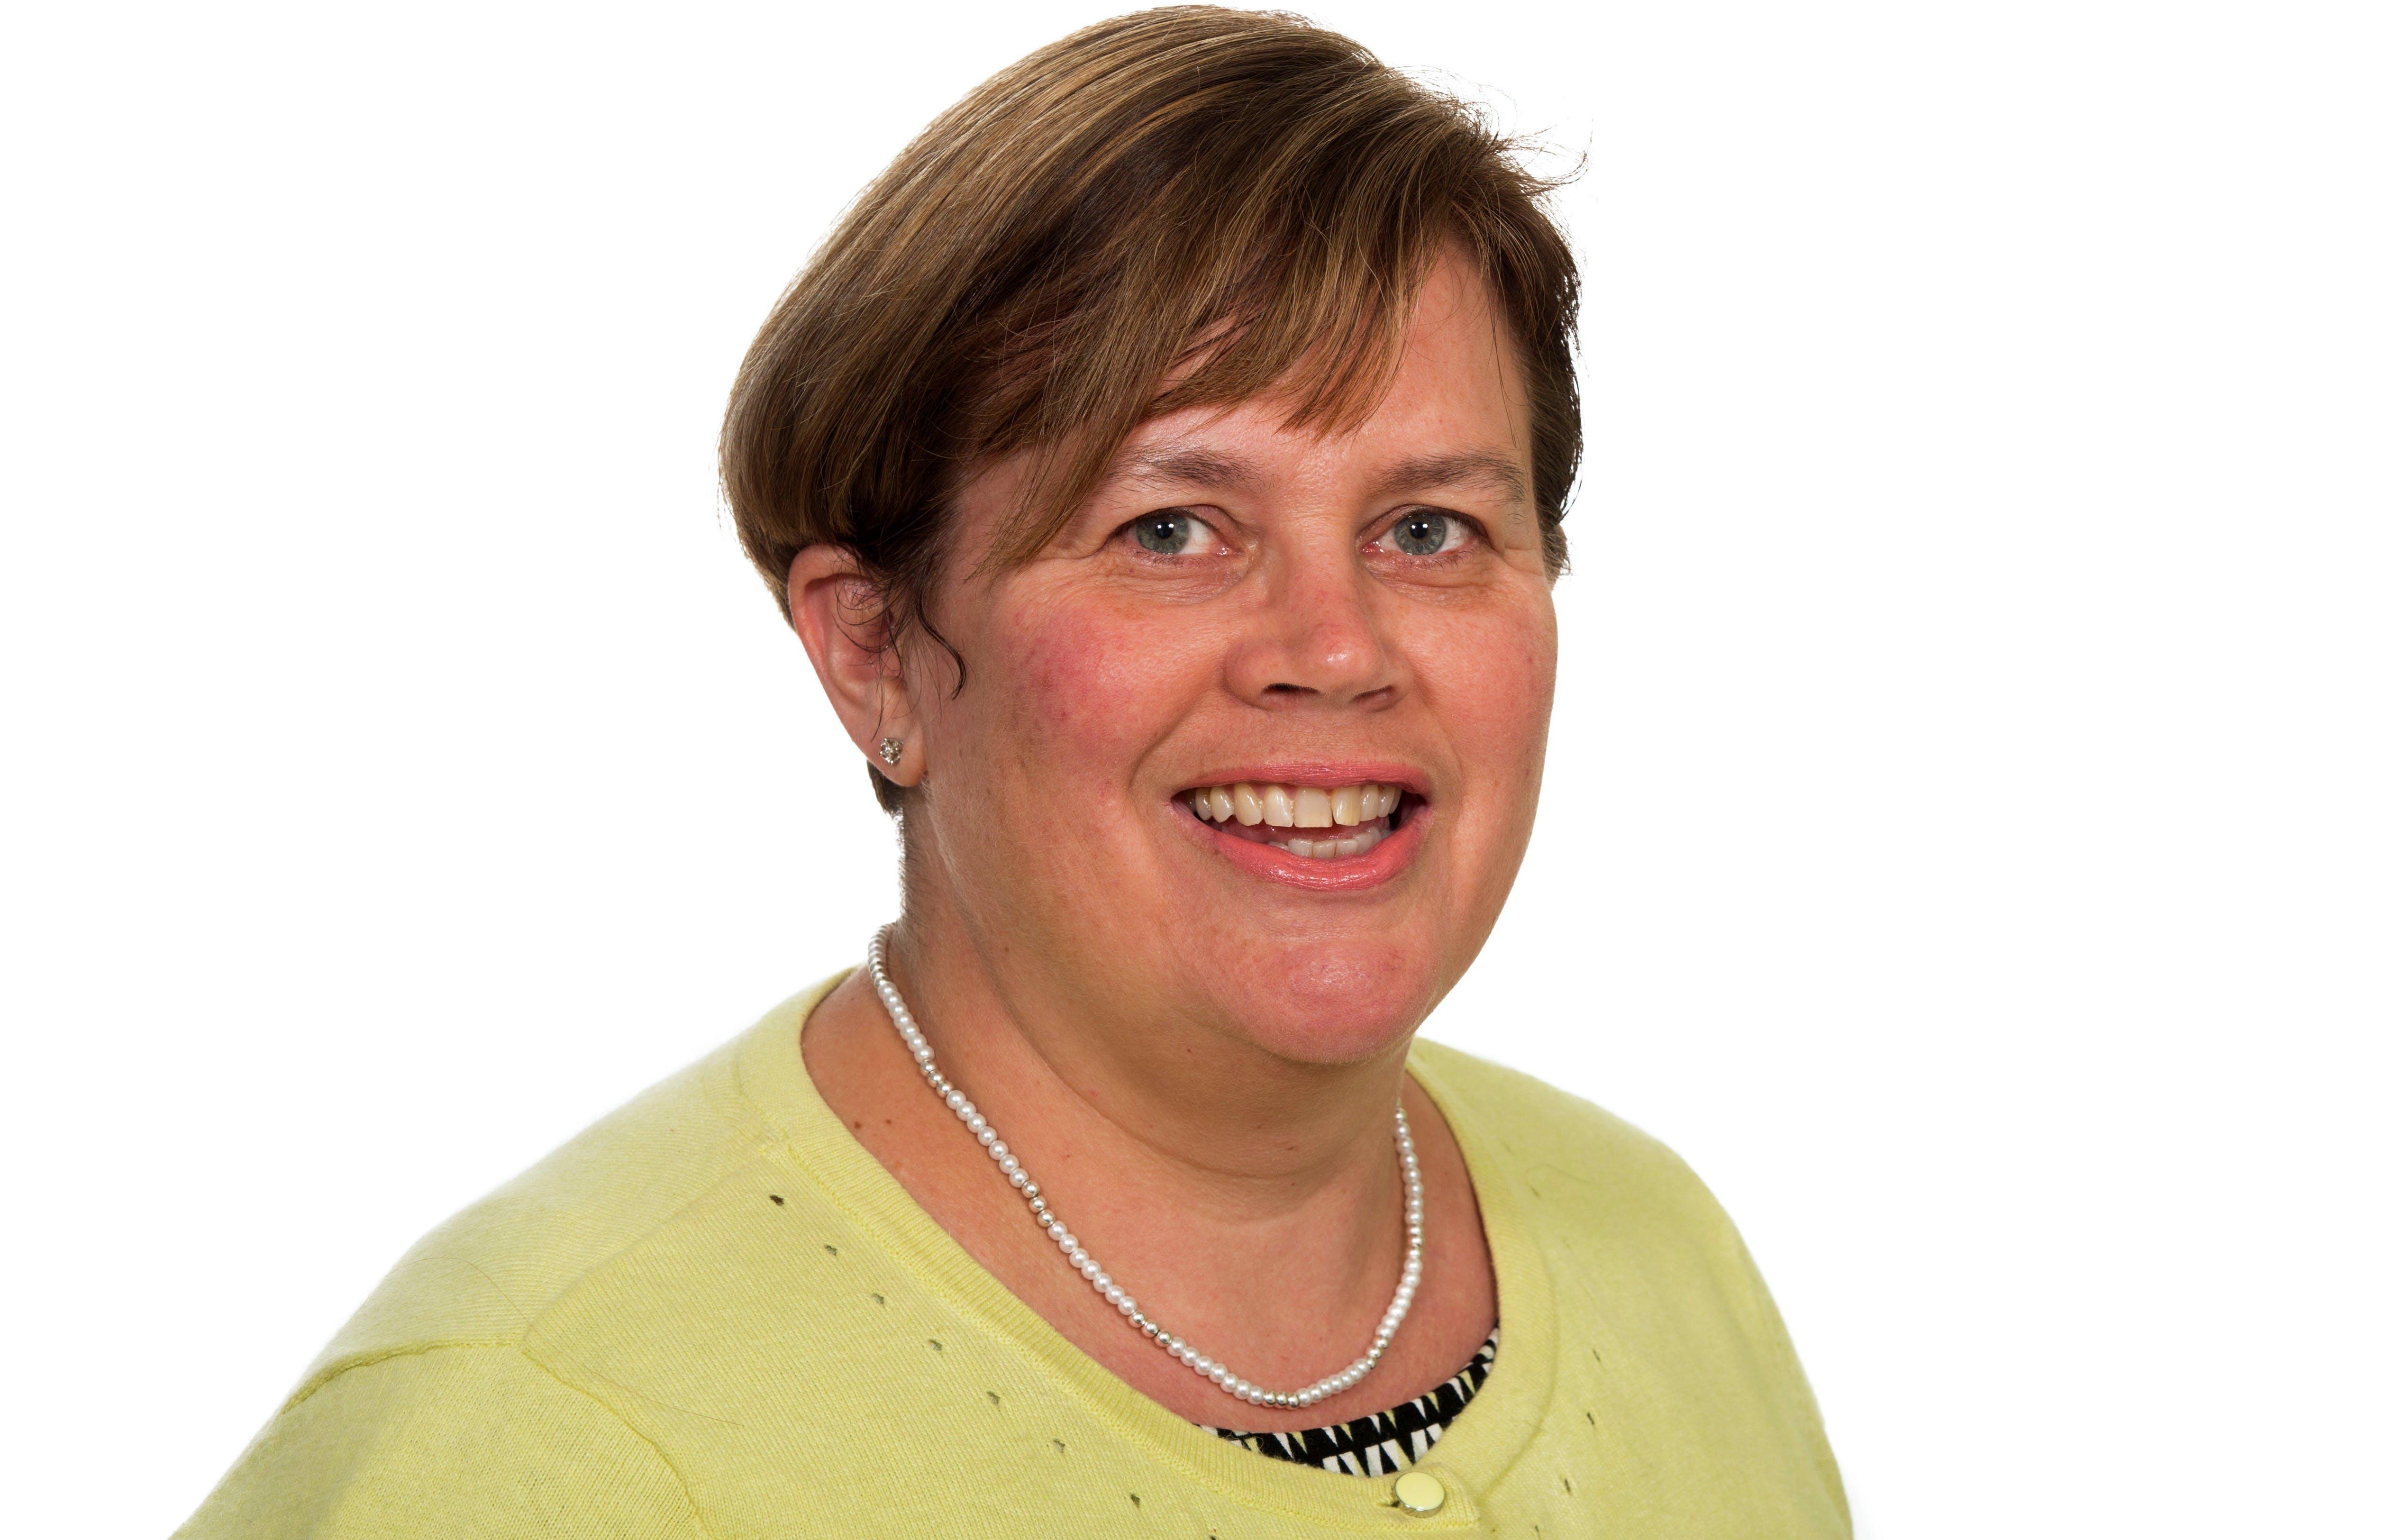 Sharon Renouf